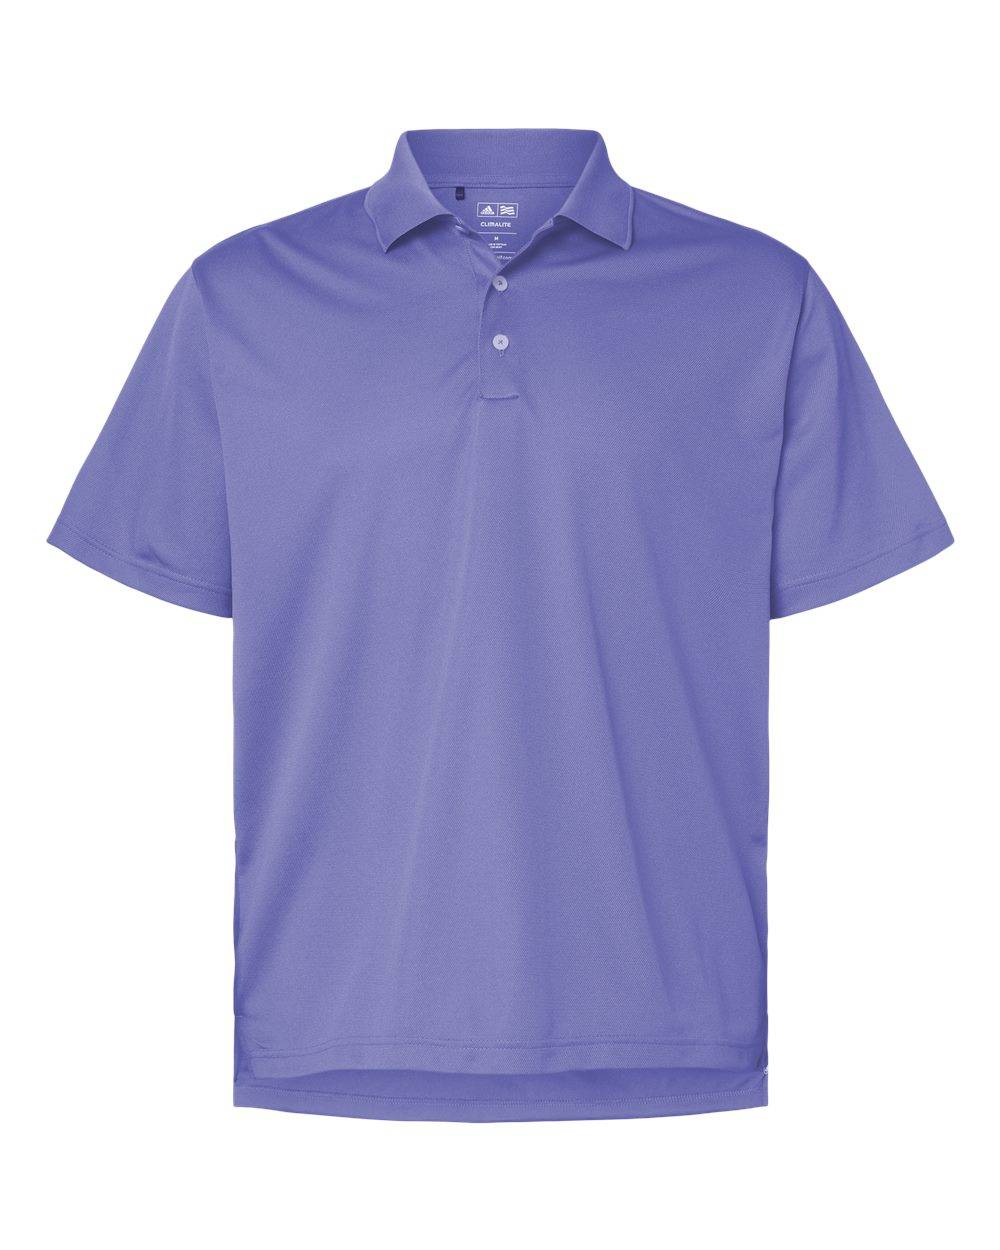 Adidas - Basic Sport Shirt - A130 - Light Flash Purple/ Black - 4X-Large